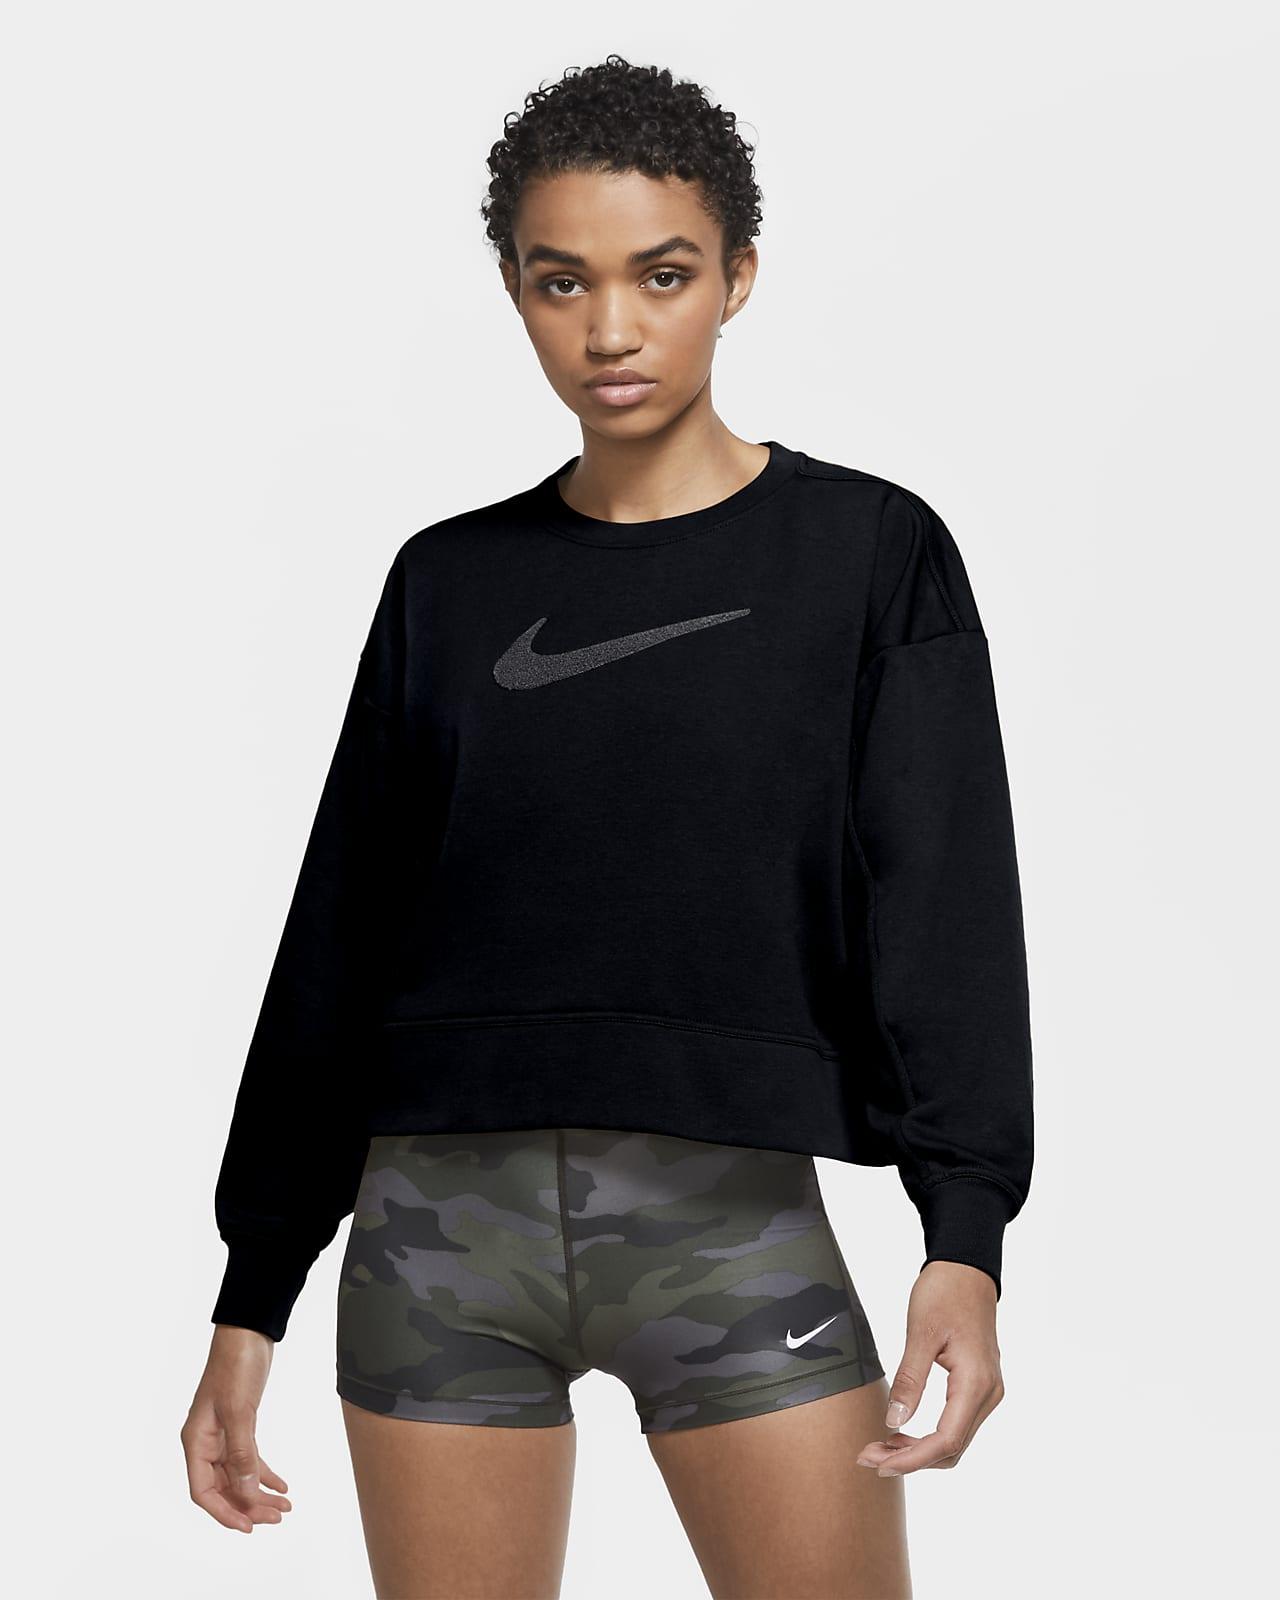 Nike Dri-FIT Get Fit Swoosh treningsgenser til dame